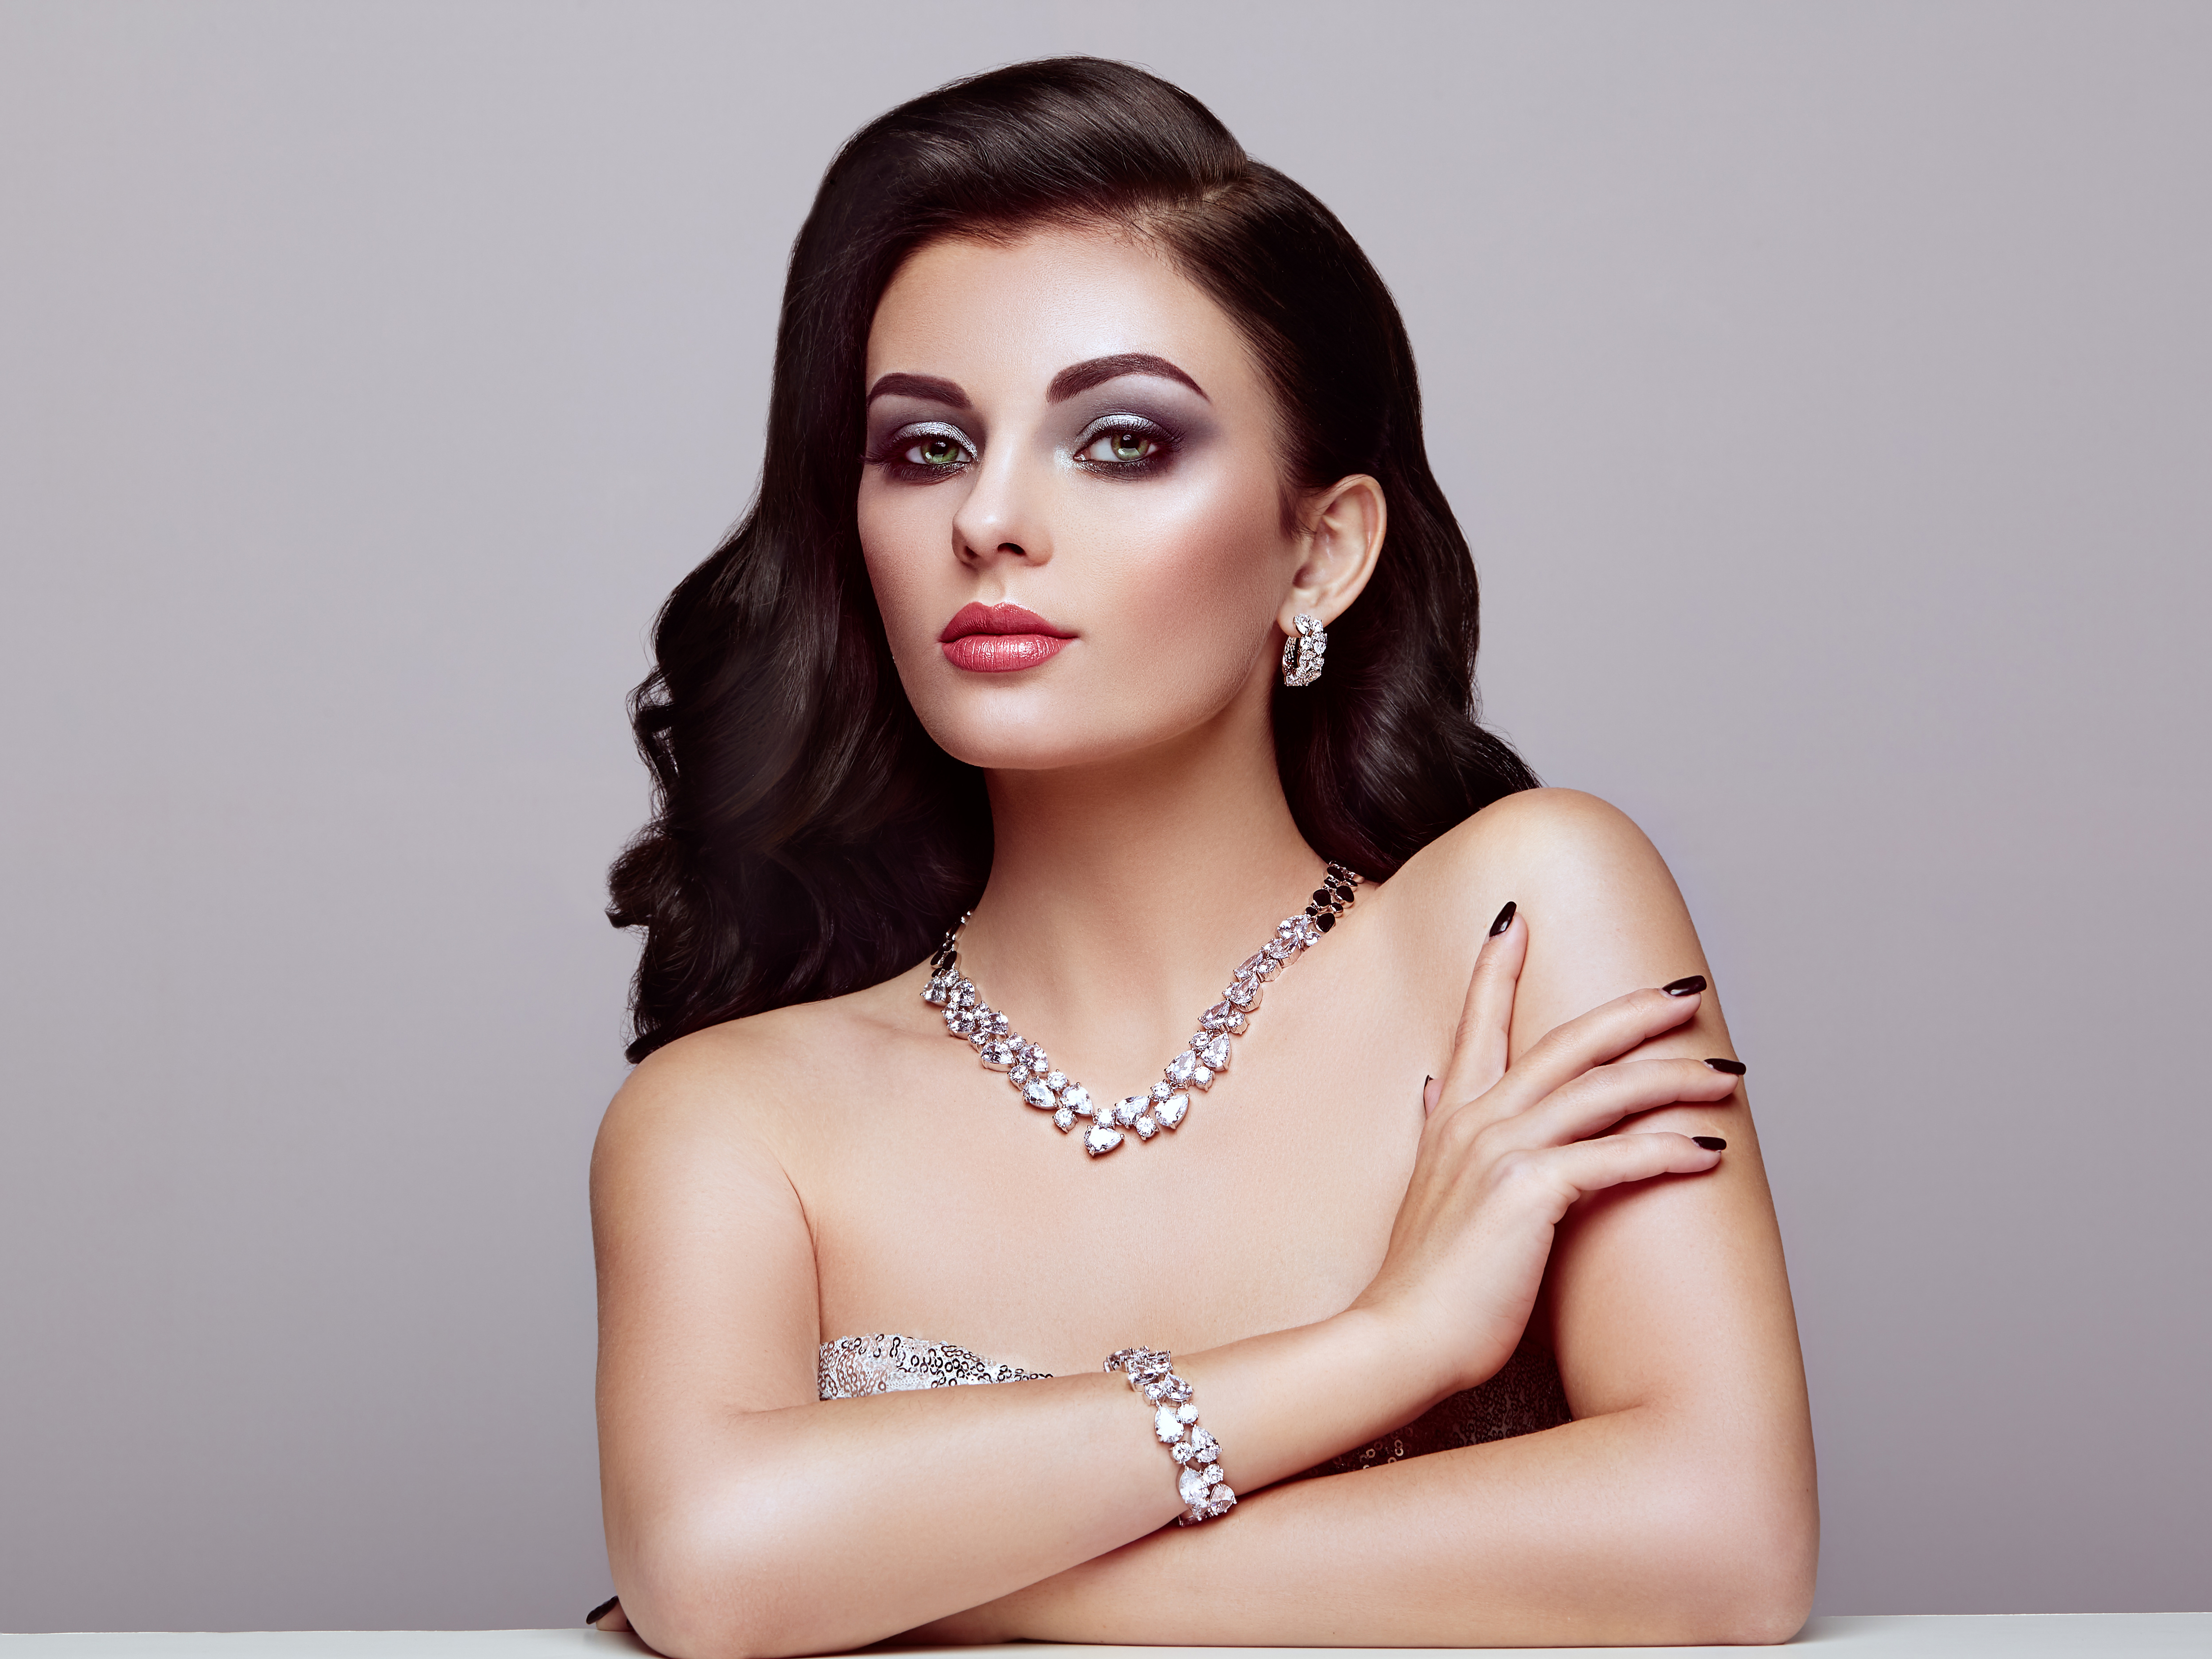 model wearing jewellery 1575663962 - Model Wearing Jewellery -